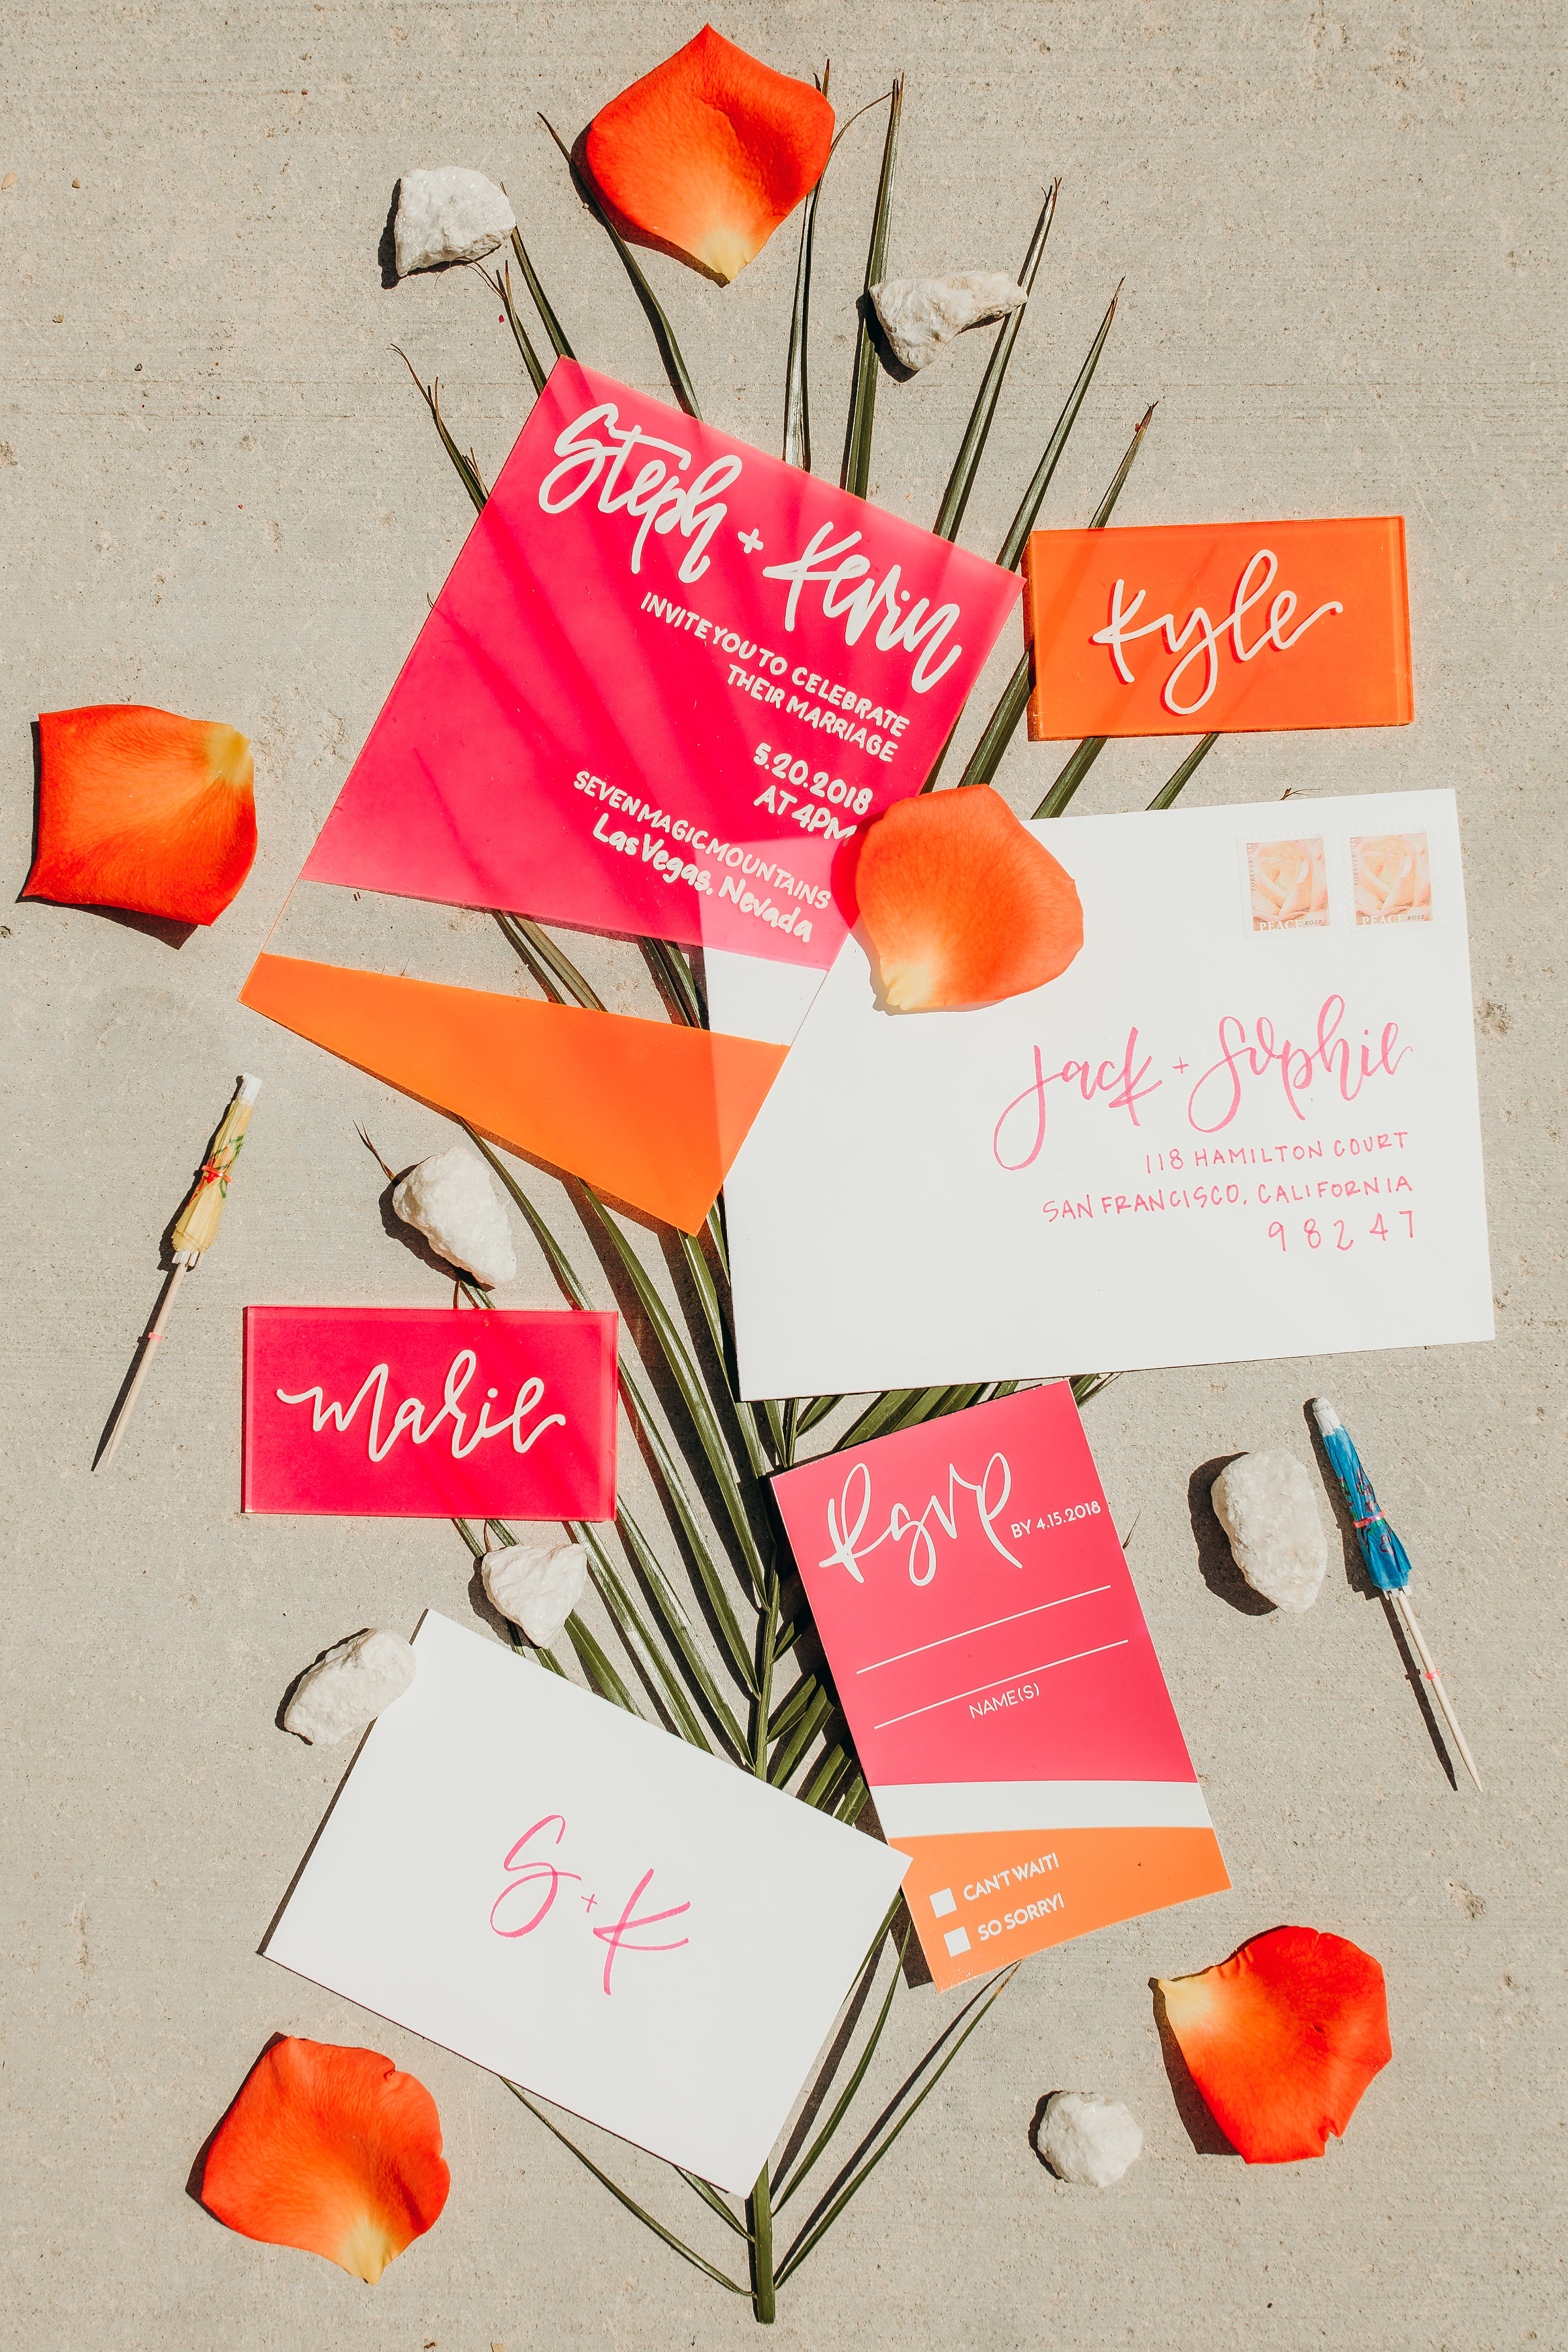 love-fern-design-studio-custom-wedding-invitations-for-the-modern-couple-modern-calligraphy-in-seattle-washington-custom-wedding-stationery-neon-acrylic-retro-Vegas-elopement